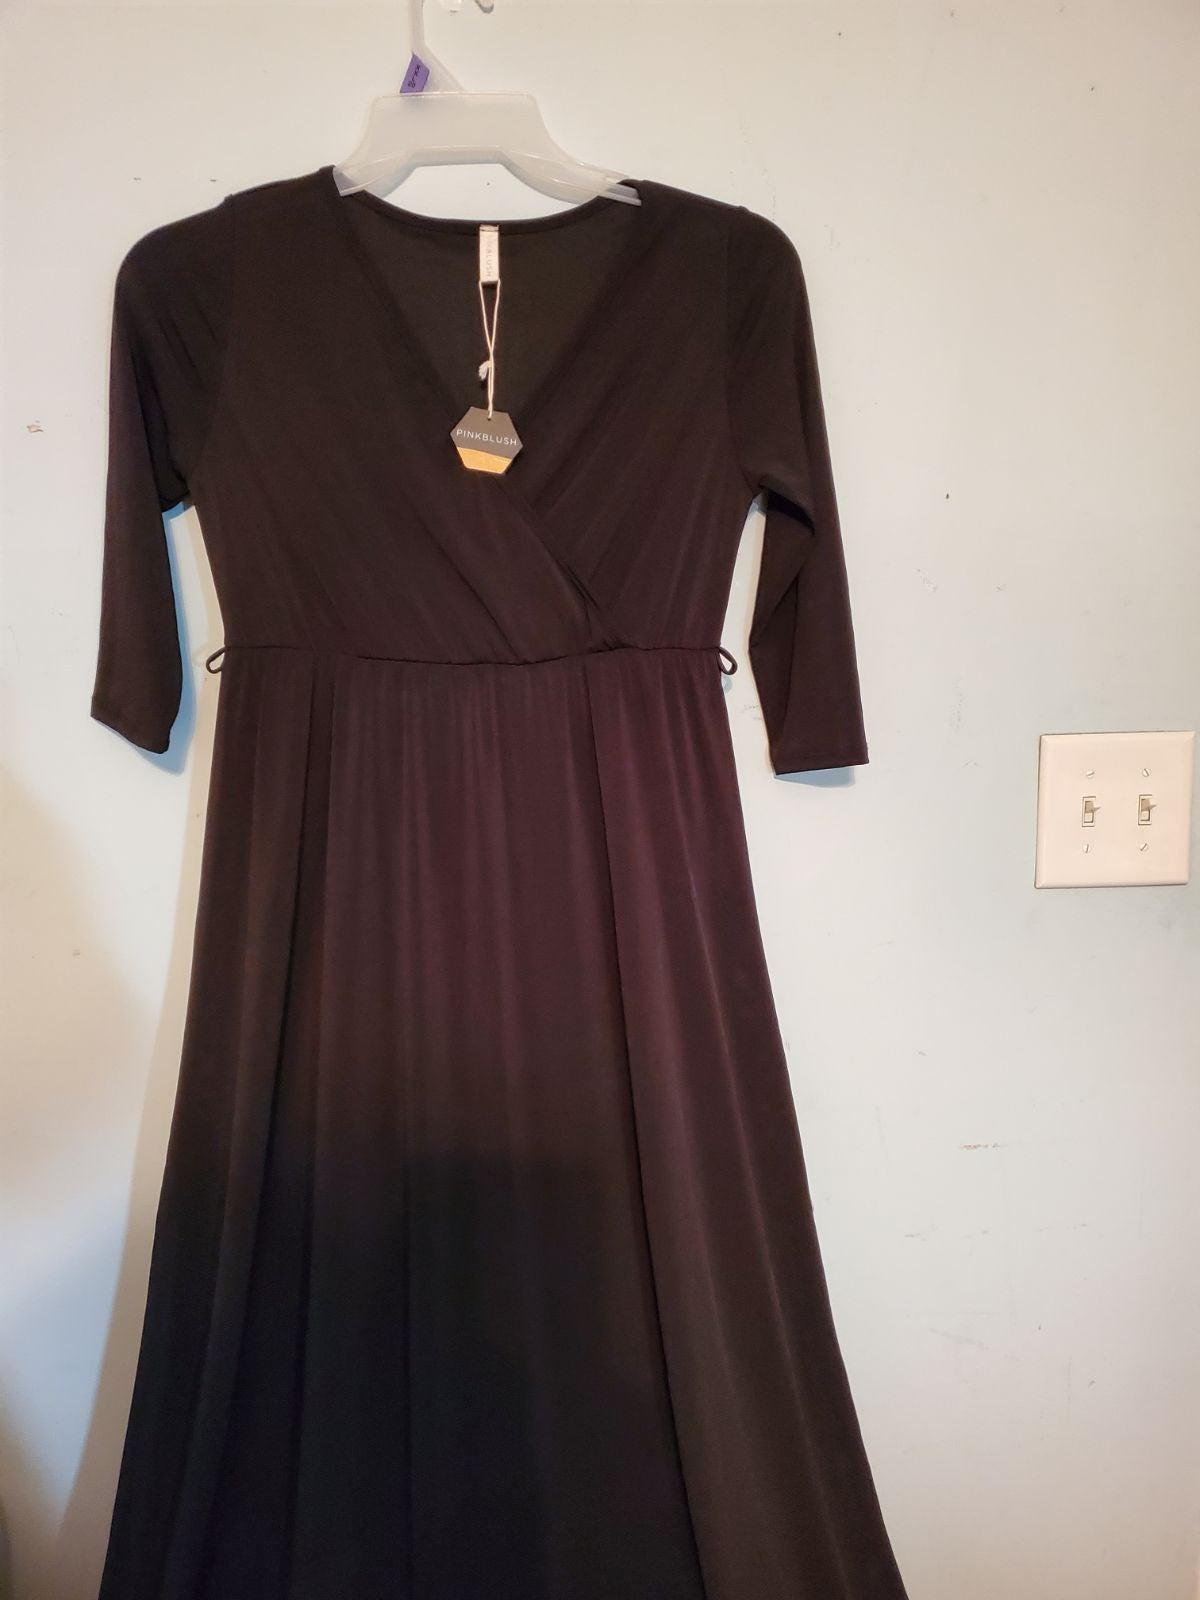 Pinkblush black v-neck dress